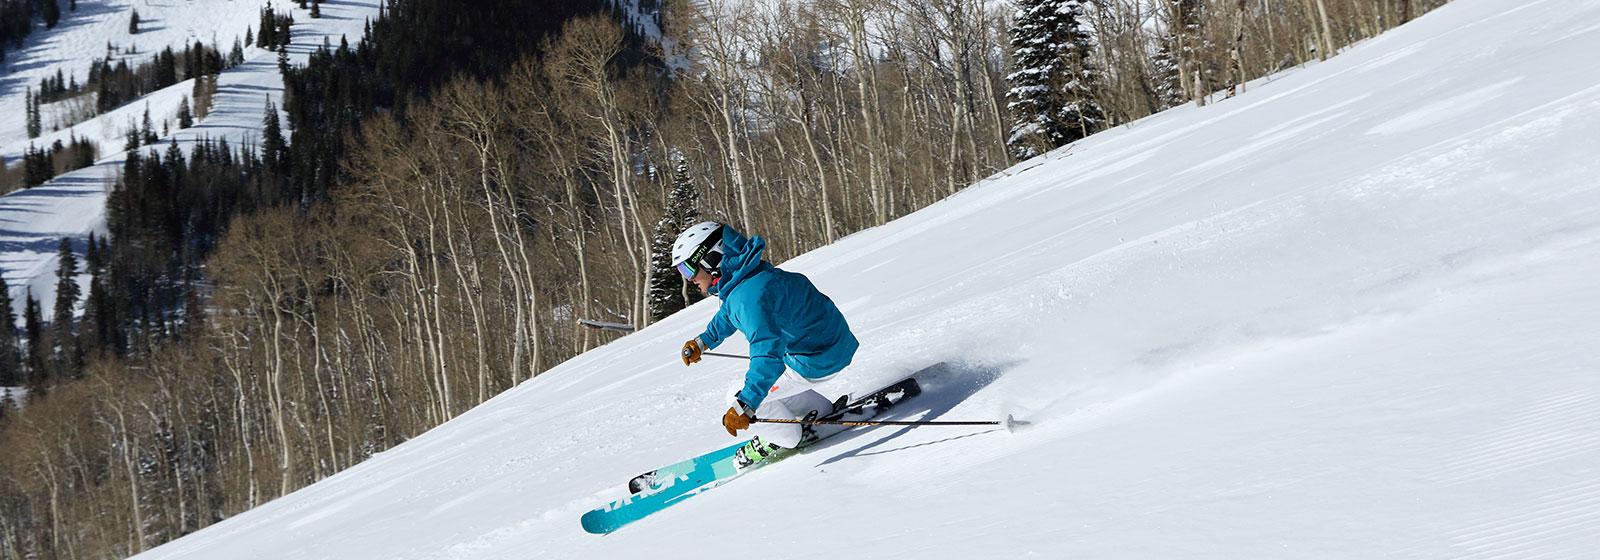 Park City Utah Official Website Hotels Skiing Snowboarding Restaurants Events Winter Ski Vacation Information